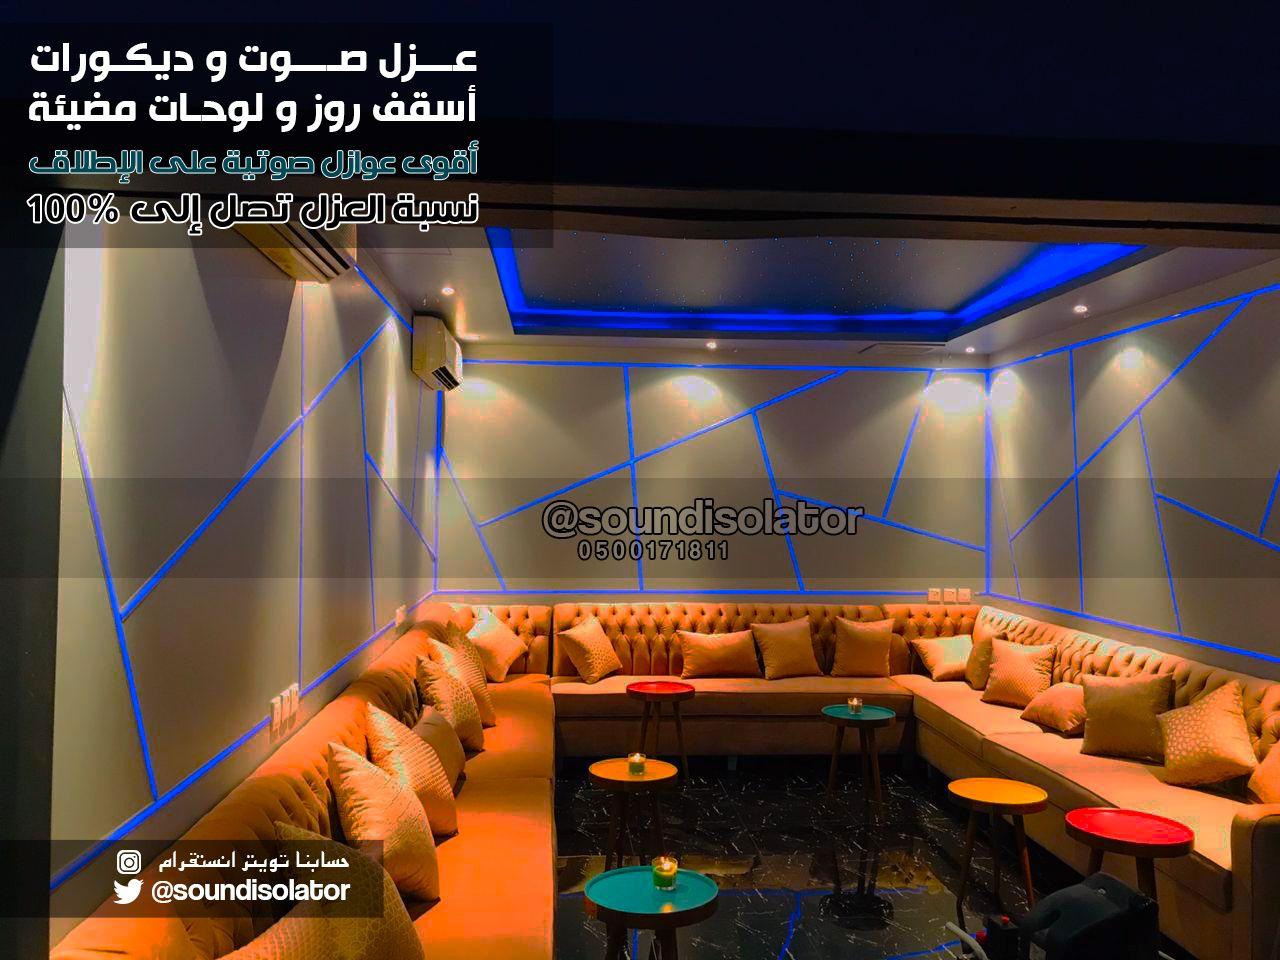 سقف روز الرياض Blog Page 18th